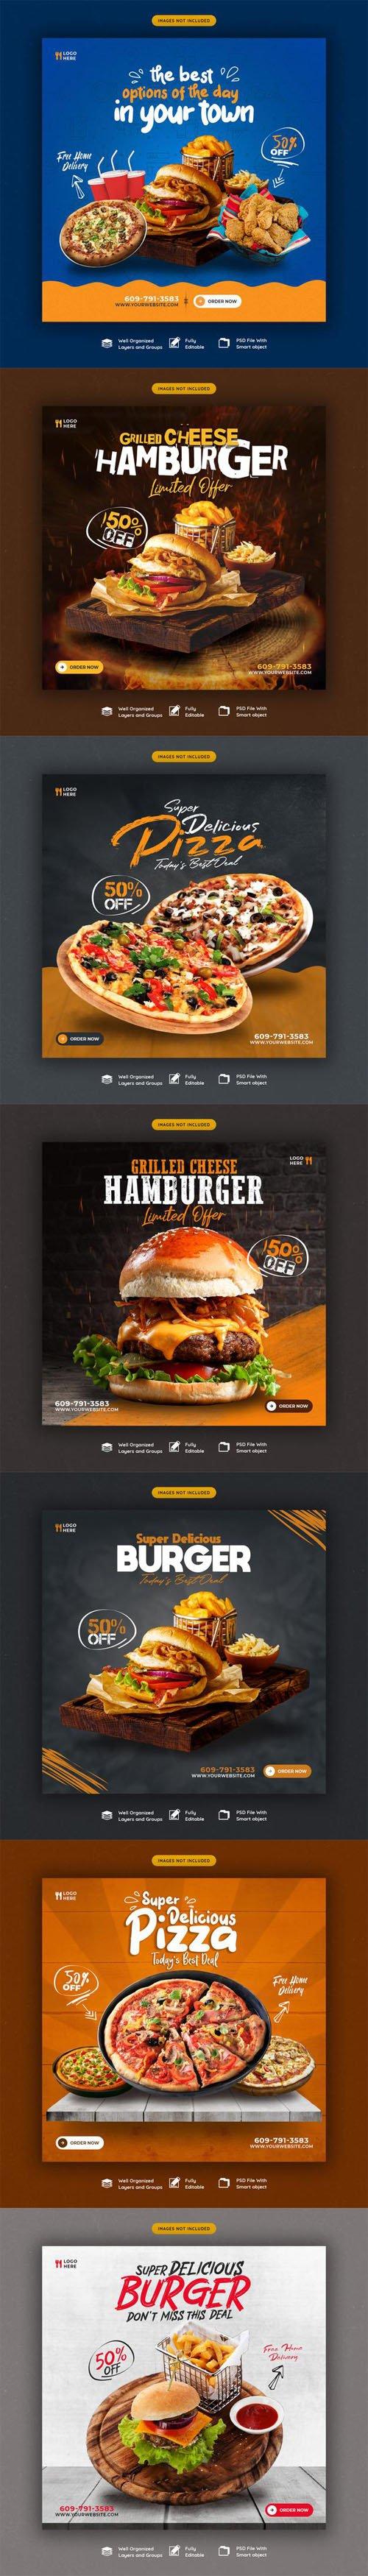 Delicious Food Menu & Restaurant Social Media Banners PSD Templates